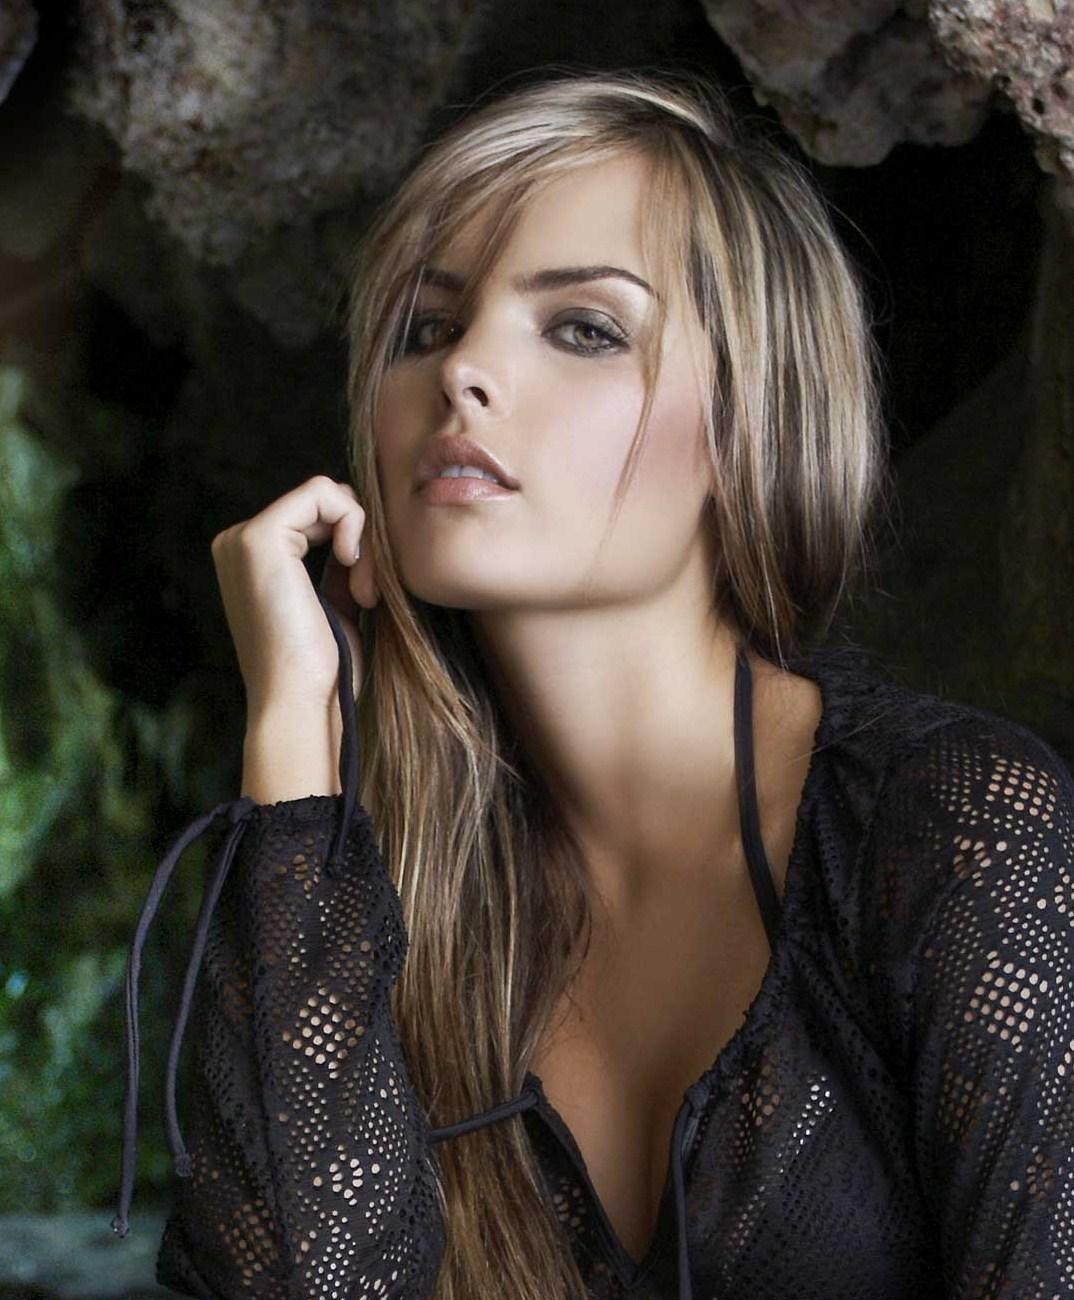 linda modelos: